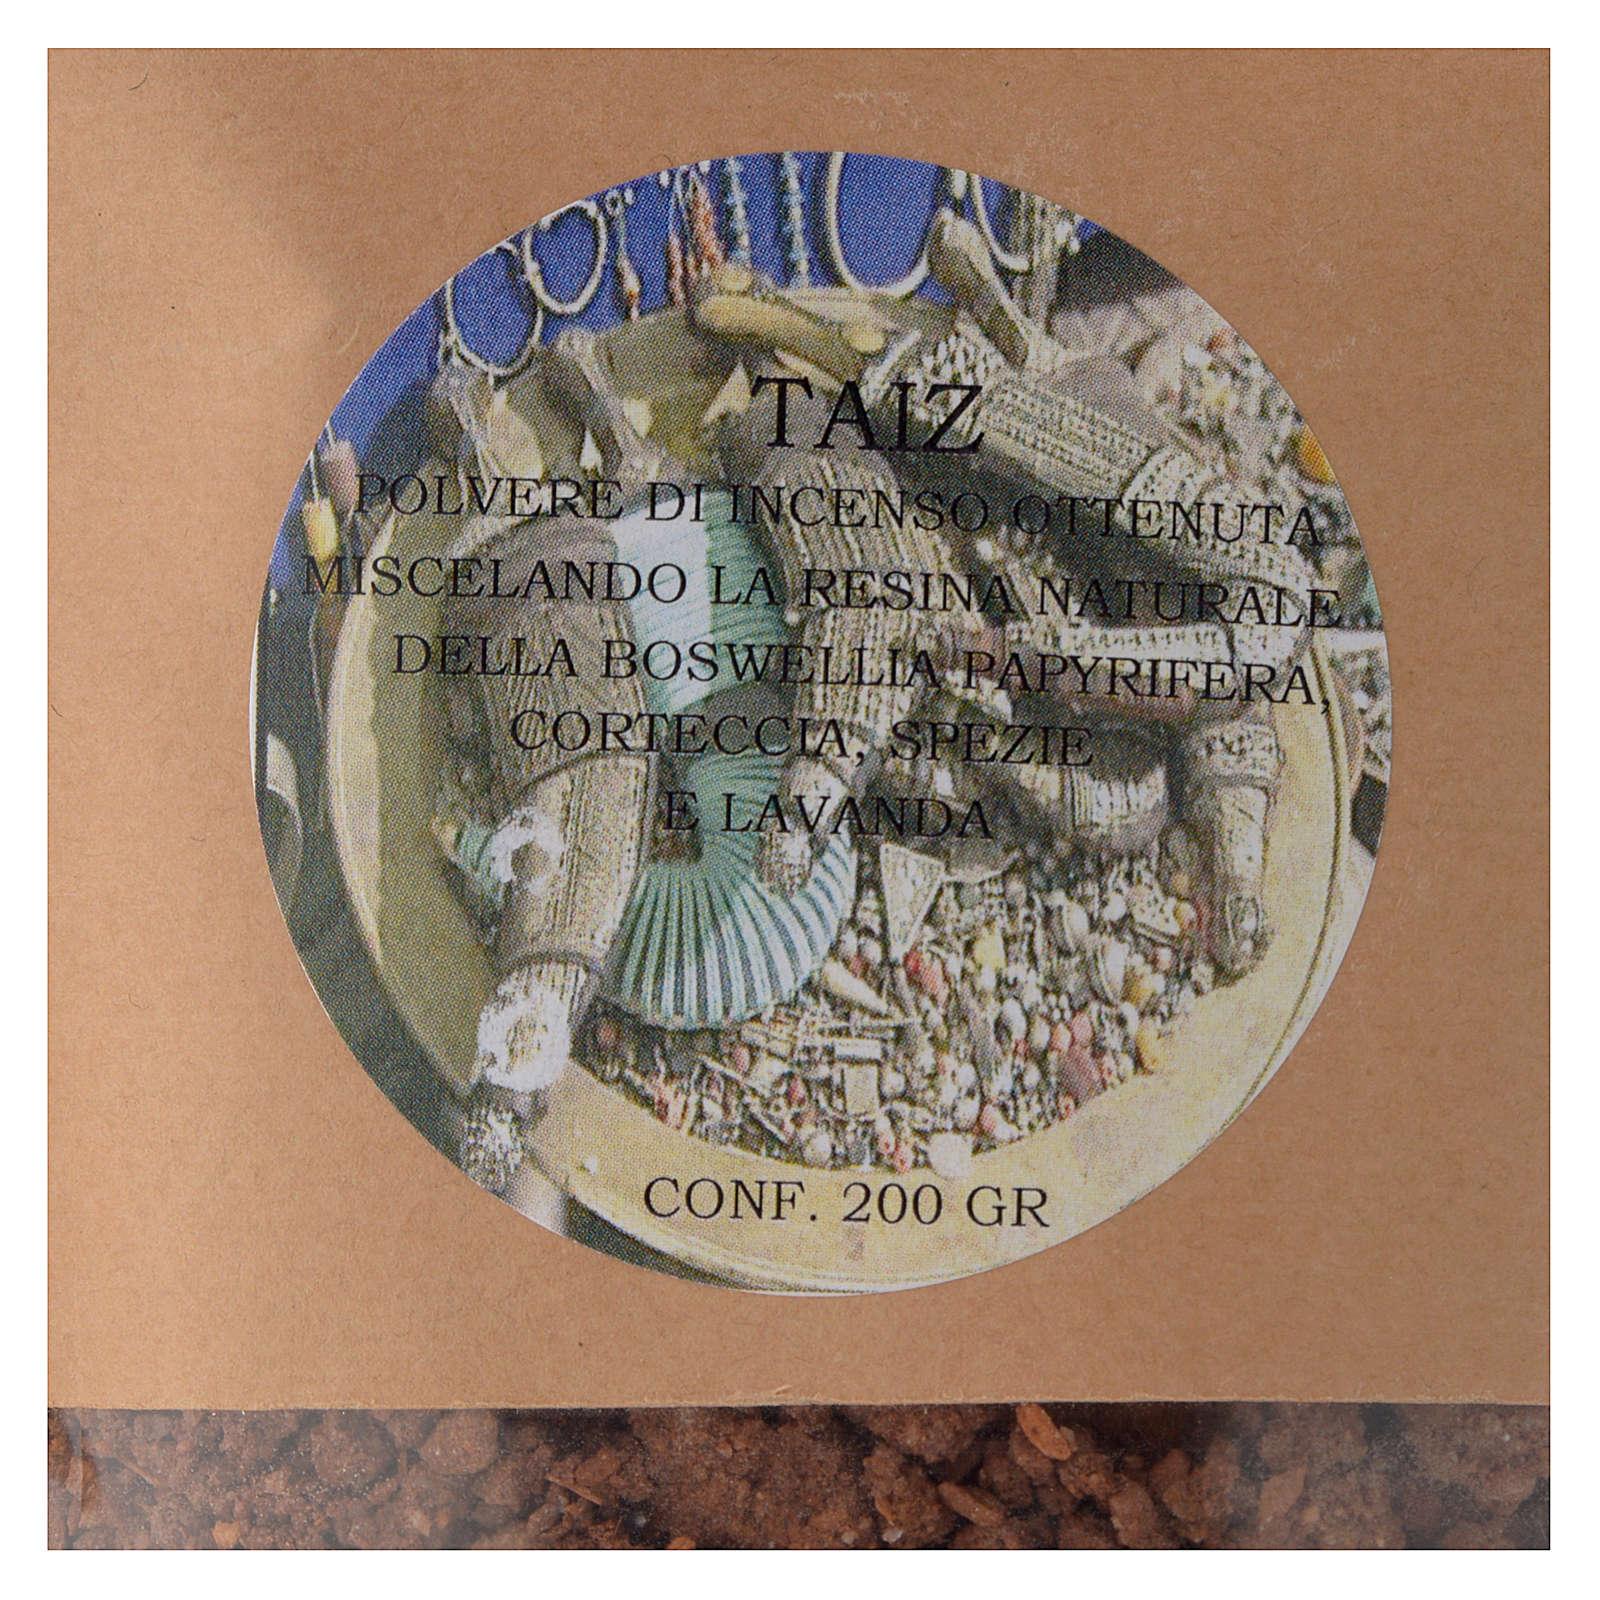 Taiz incense powder 200g 3